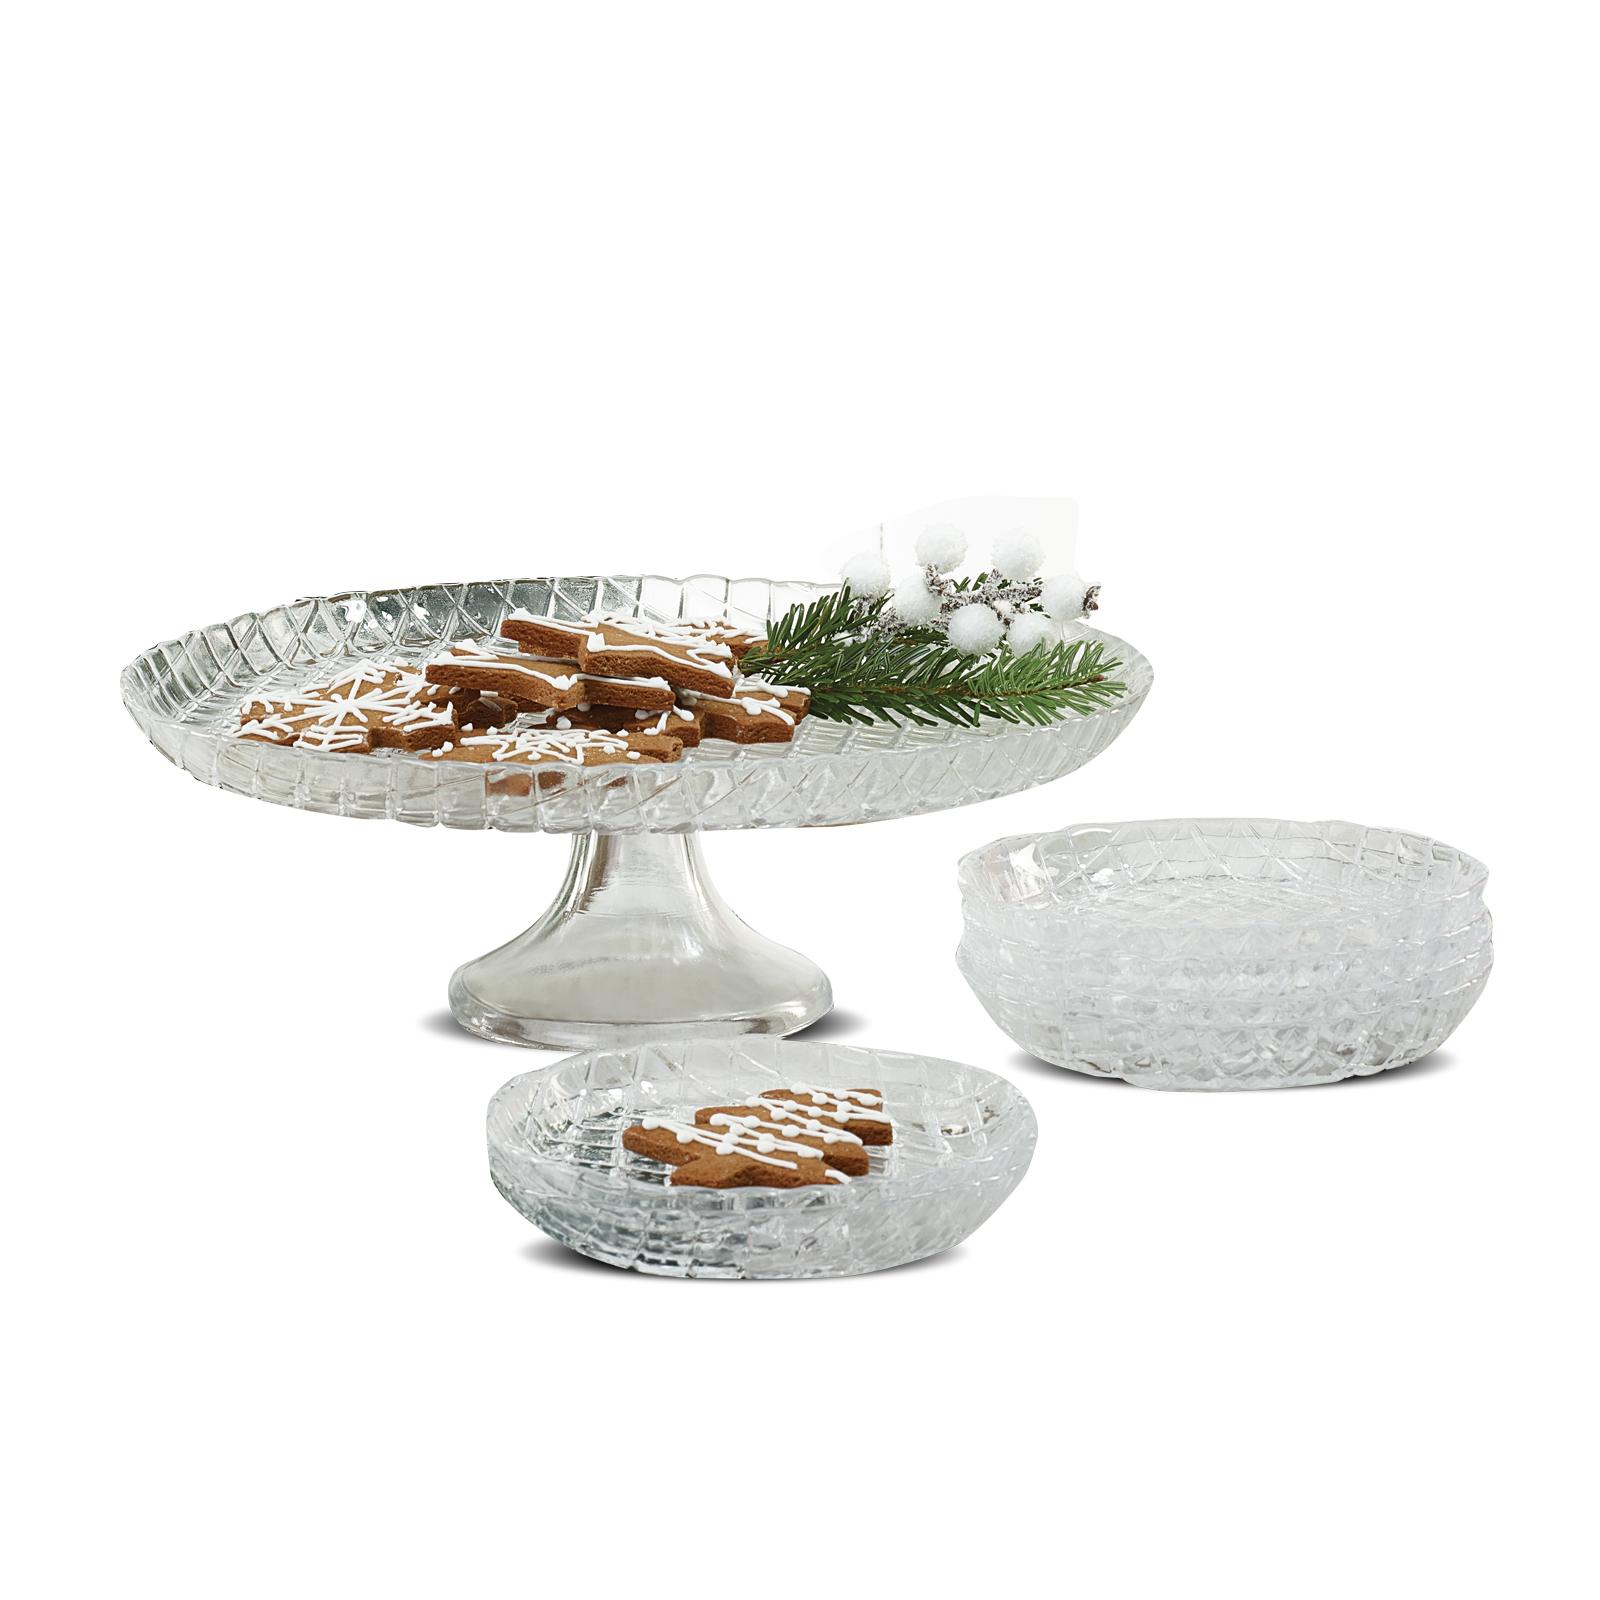 Karaca Lozange 7 Parça Tatlı Kutu/Pasta Takımı